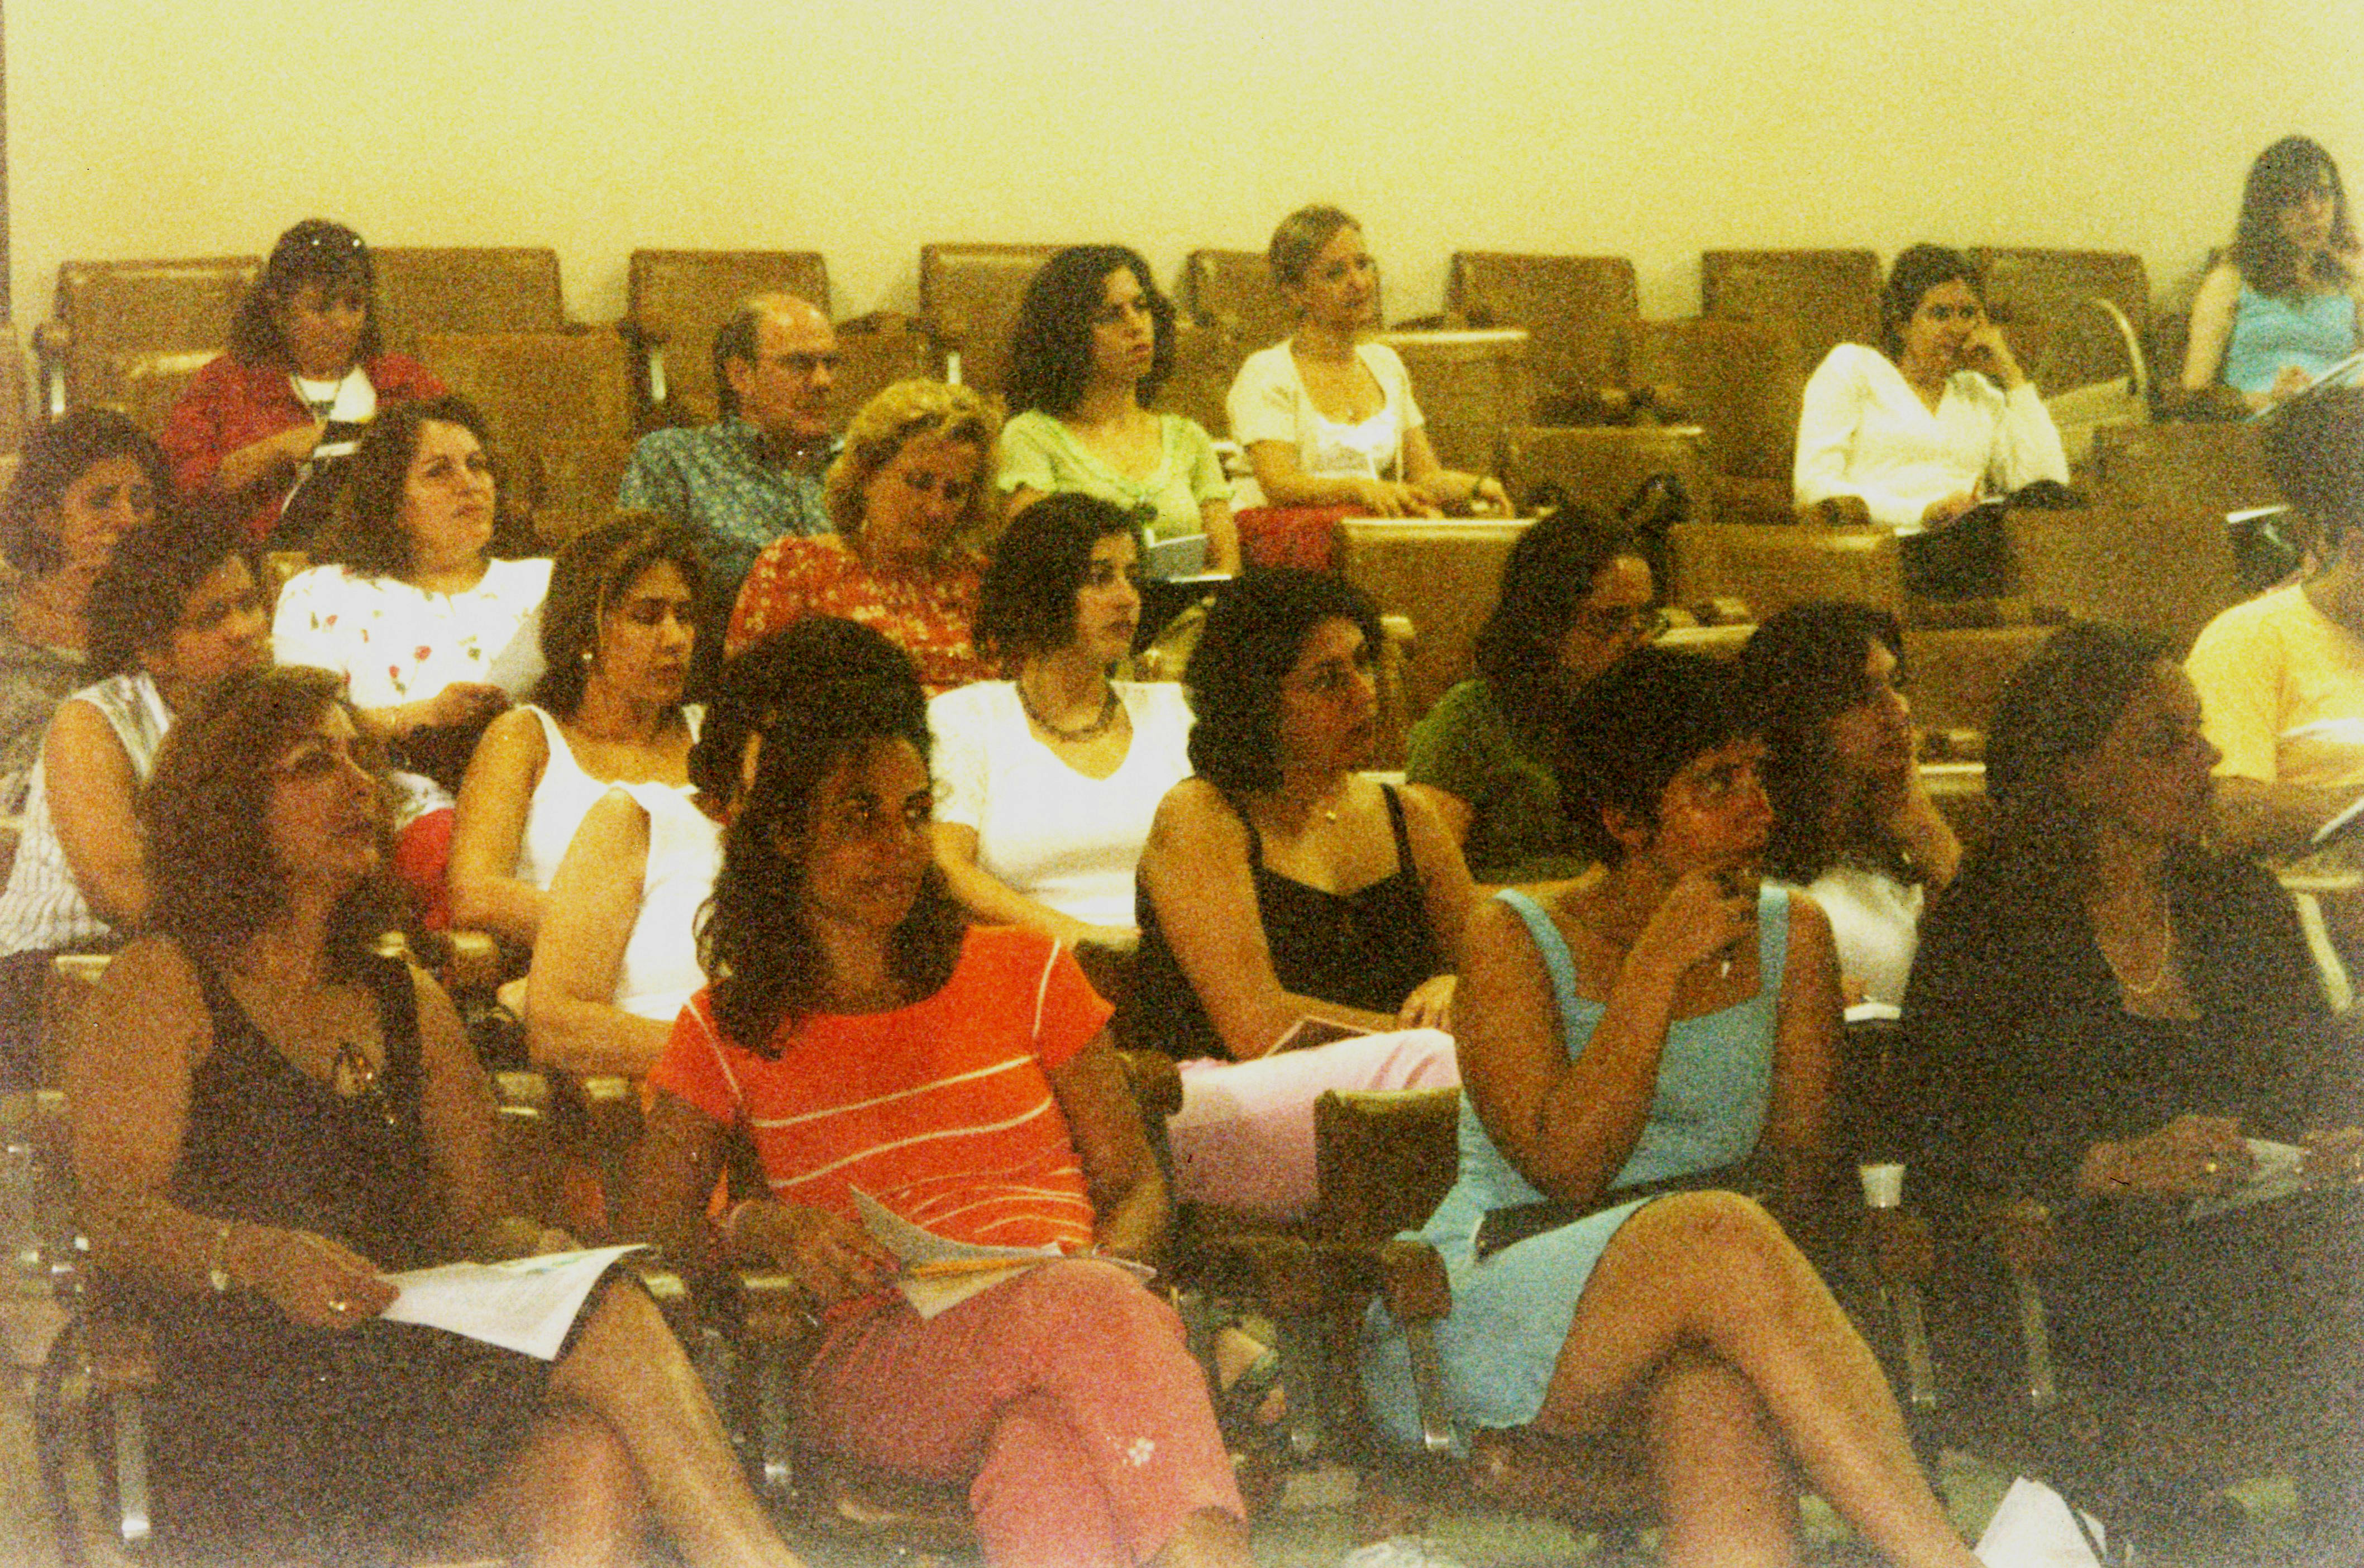 Laboratório Saúde Mental e Psicologia Clínica Social 20 anos 037